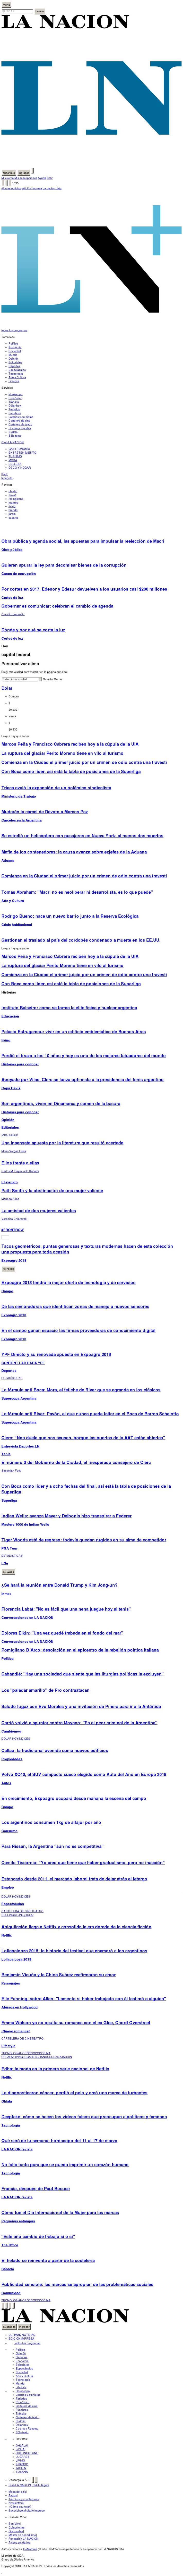 lanacion.com at Monday March 12, 2018, 5:15 a.m. UTC